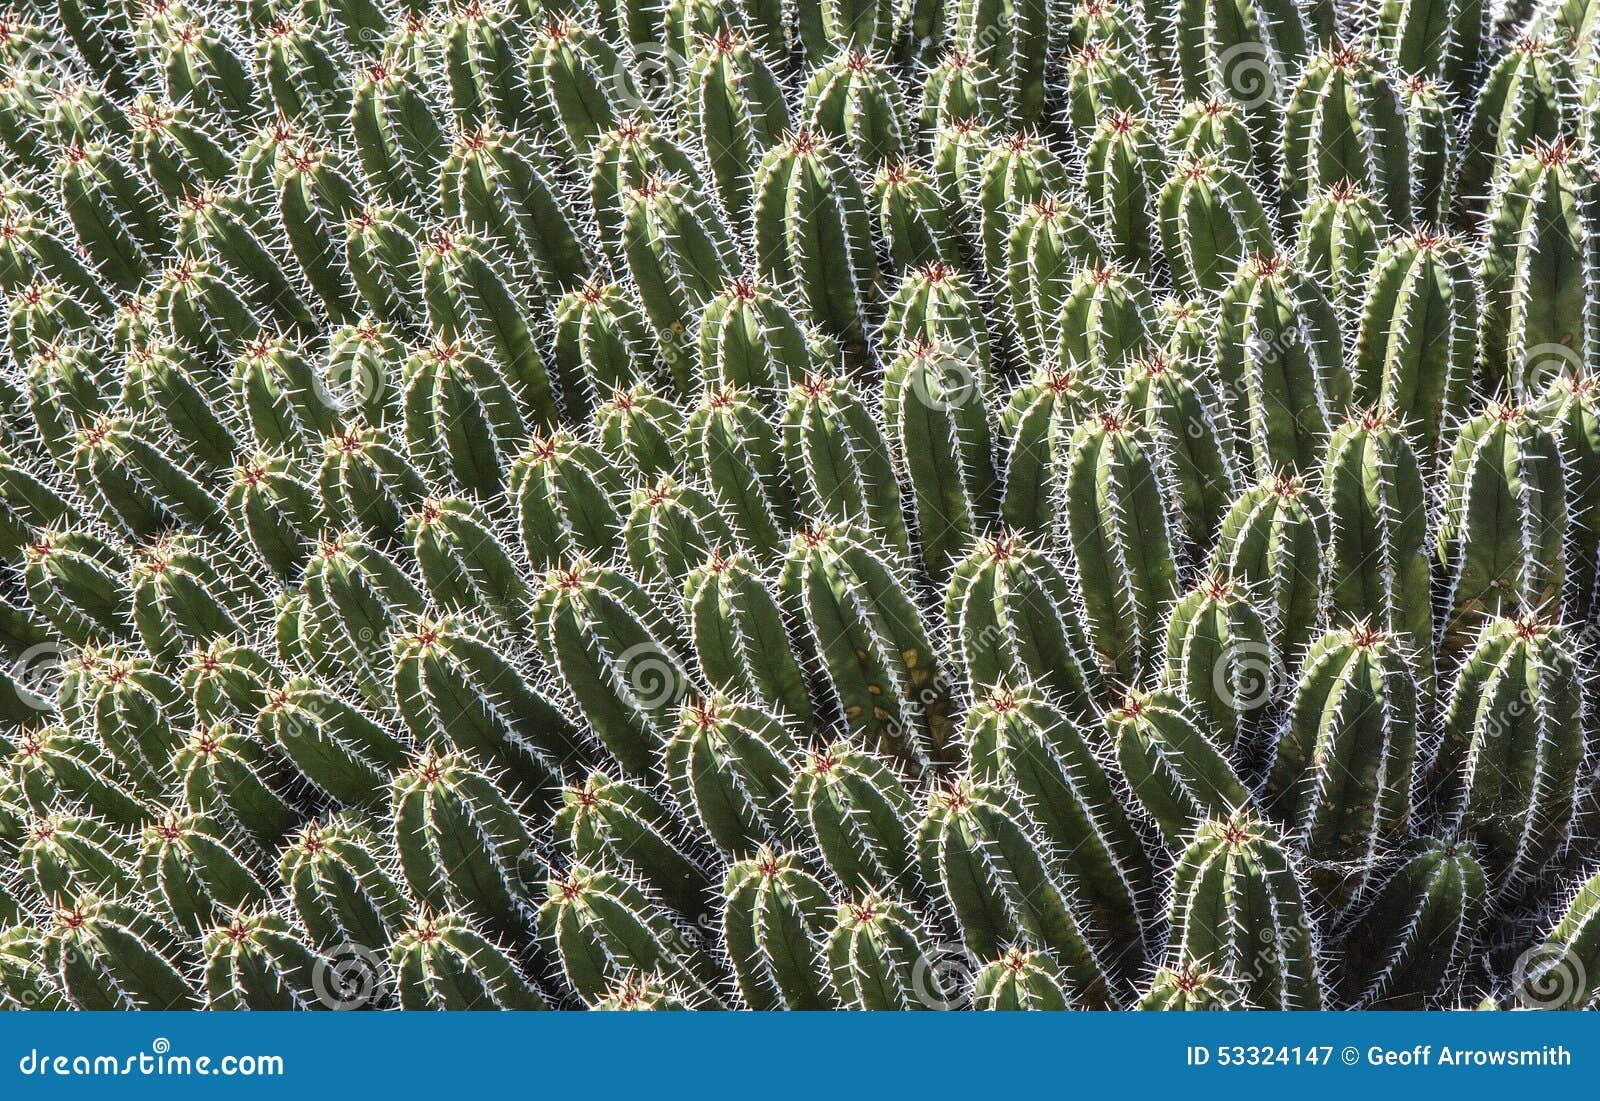 baby cacti at jardin de cactus